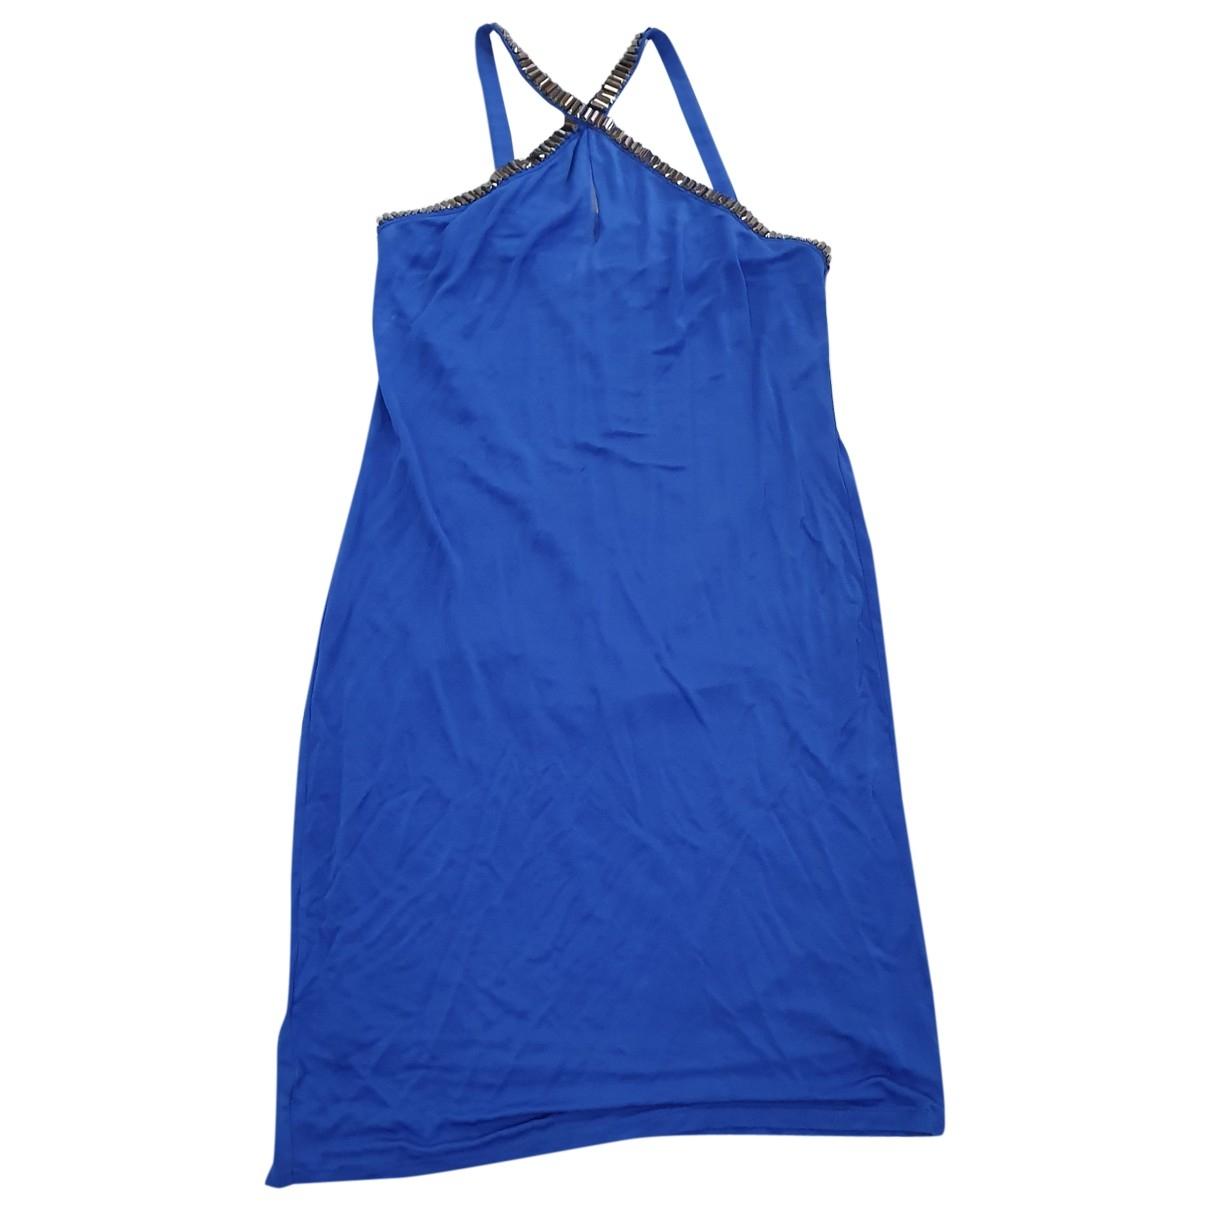 Versace Jeans \N Blue dress for Women M International